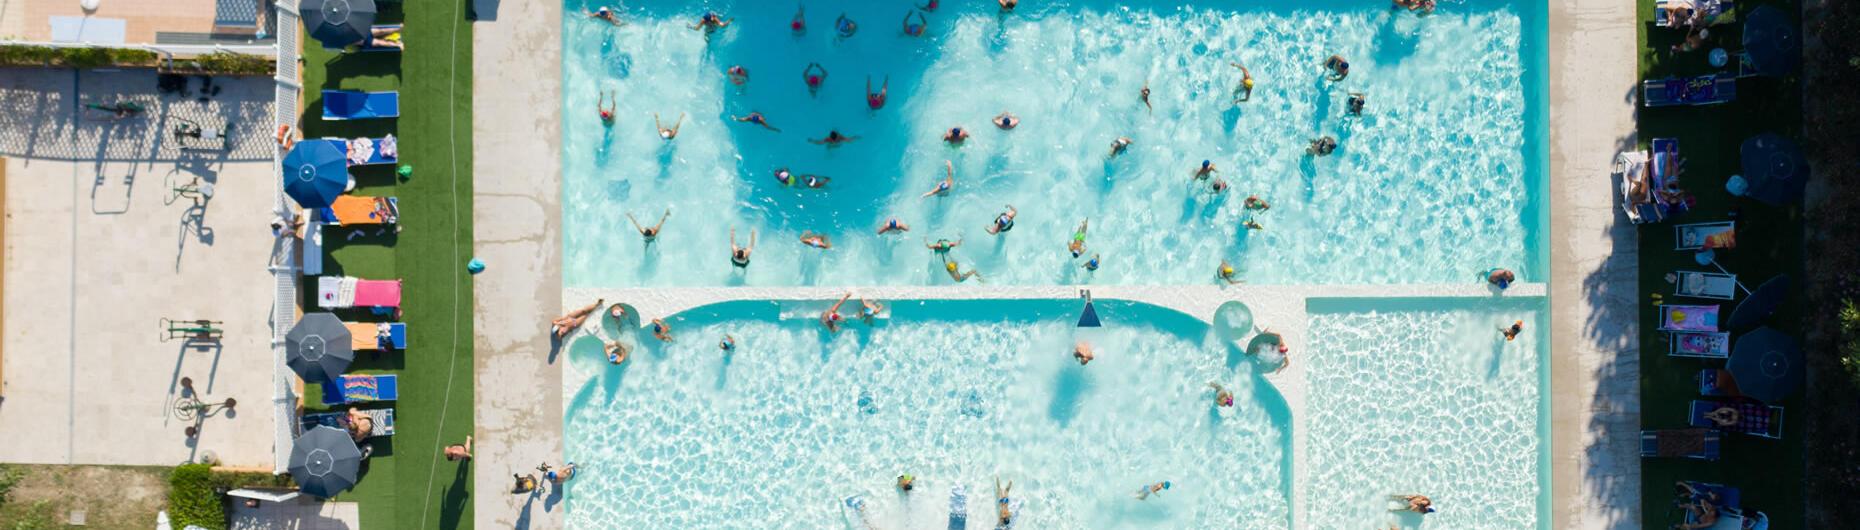 vacanzespinnaker fr camping-avec-piscine-marches 005